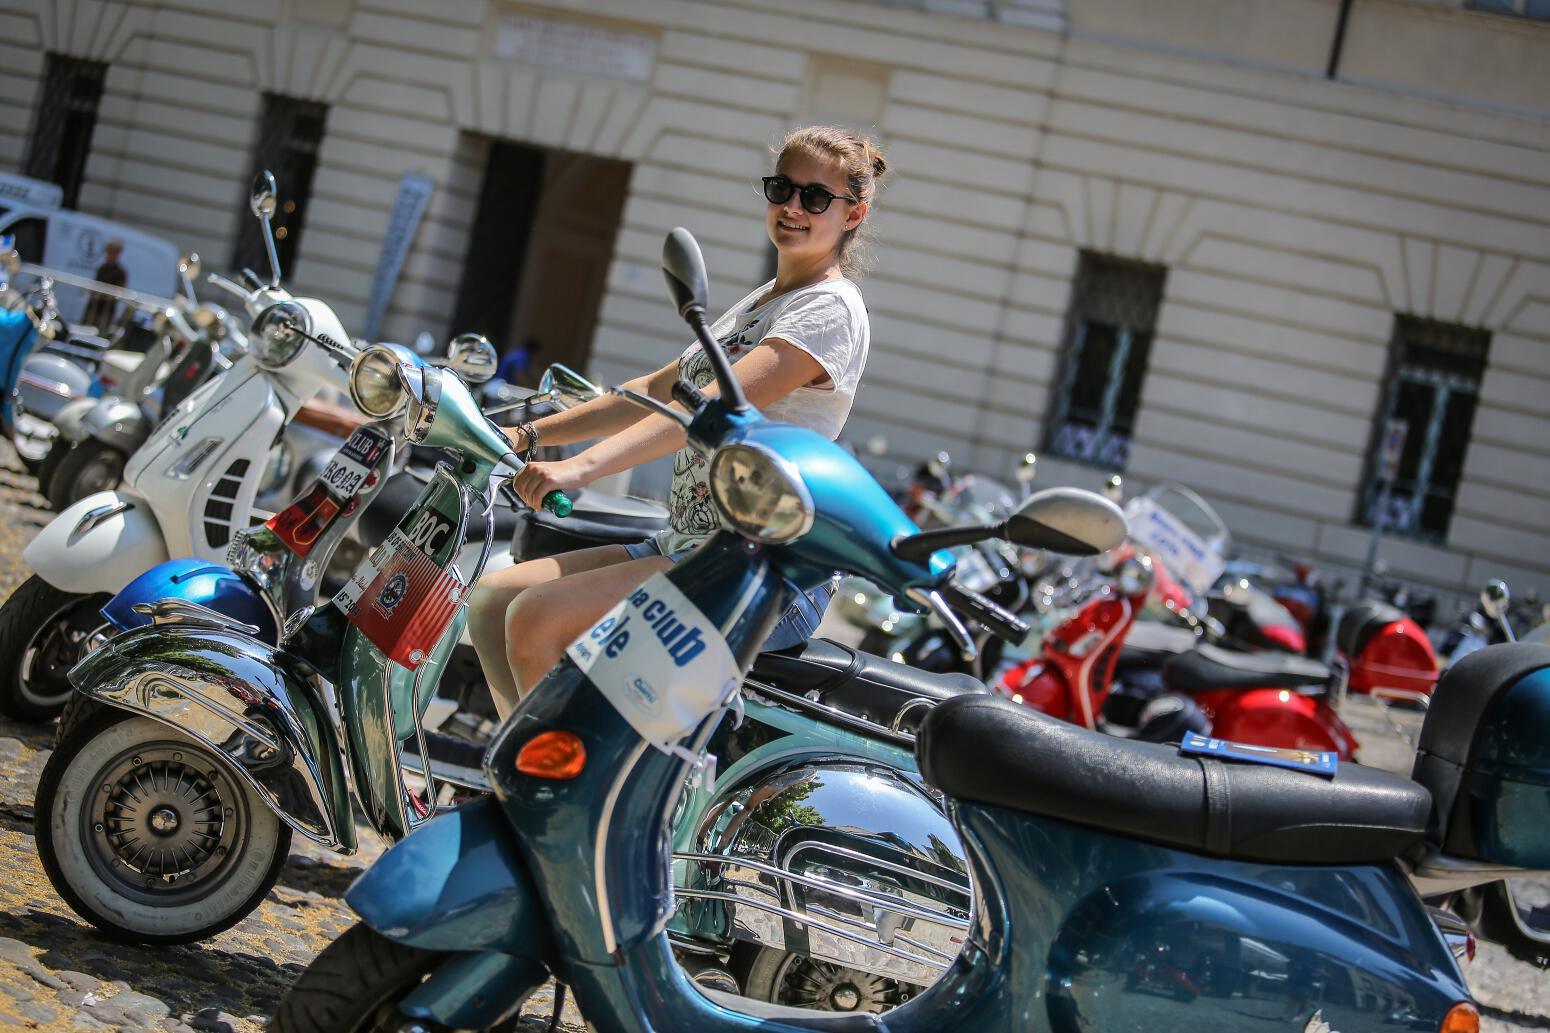 Vespa World Days 2014: Vespa-Fans feierten Kult-Roller. © spothits/Piaggio